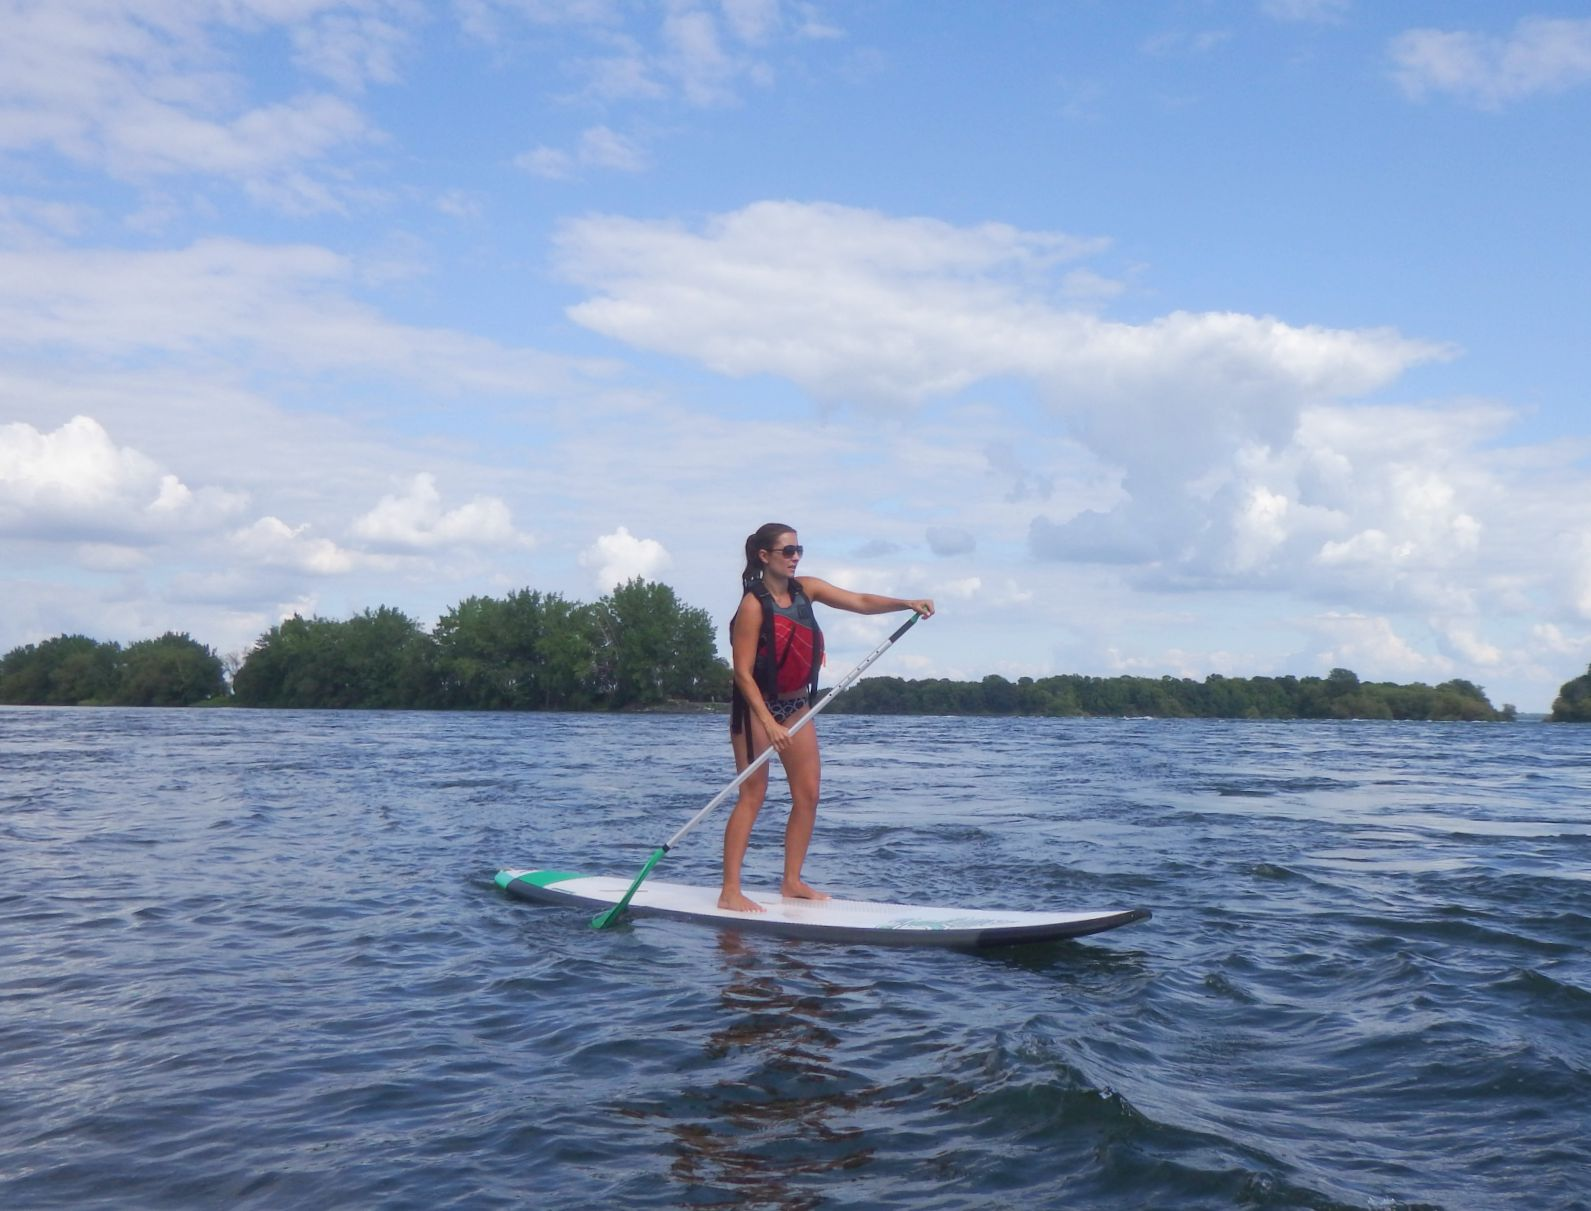 Canada-Quebec-Montreal-paddleboarding-tamara-7